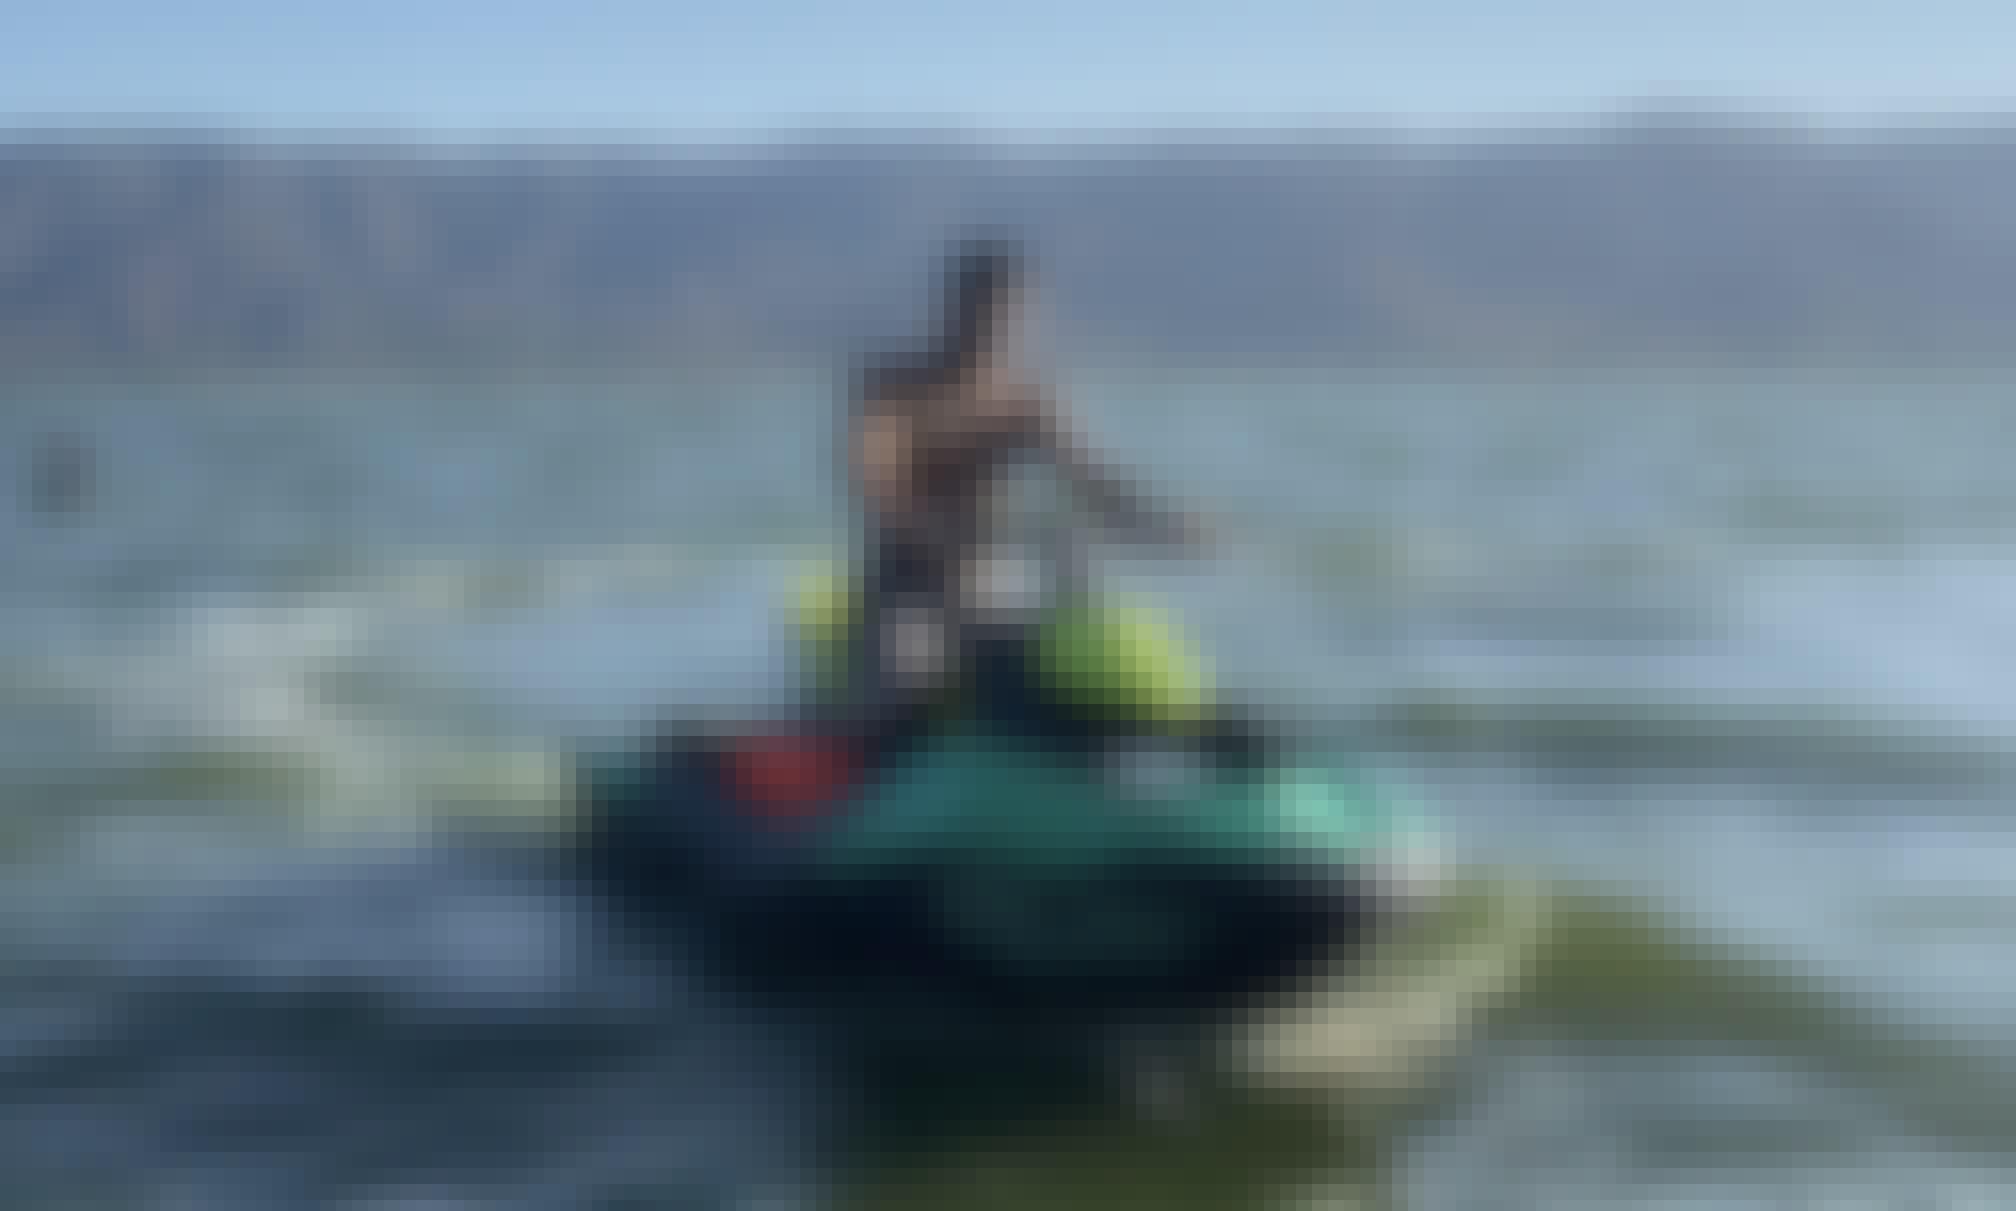 New 2021 Seadoo Spark Trixx For Rent in Marina Del Rey, California